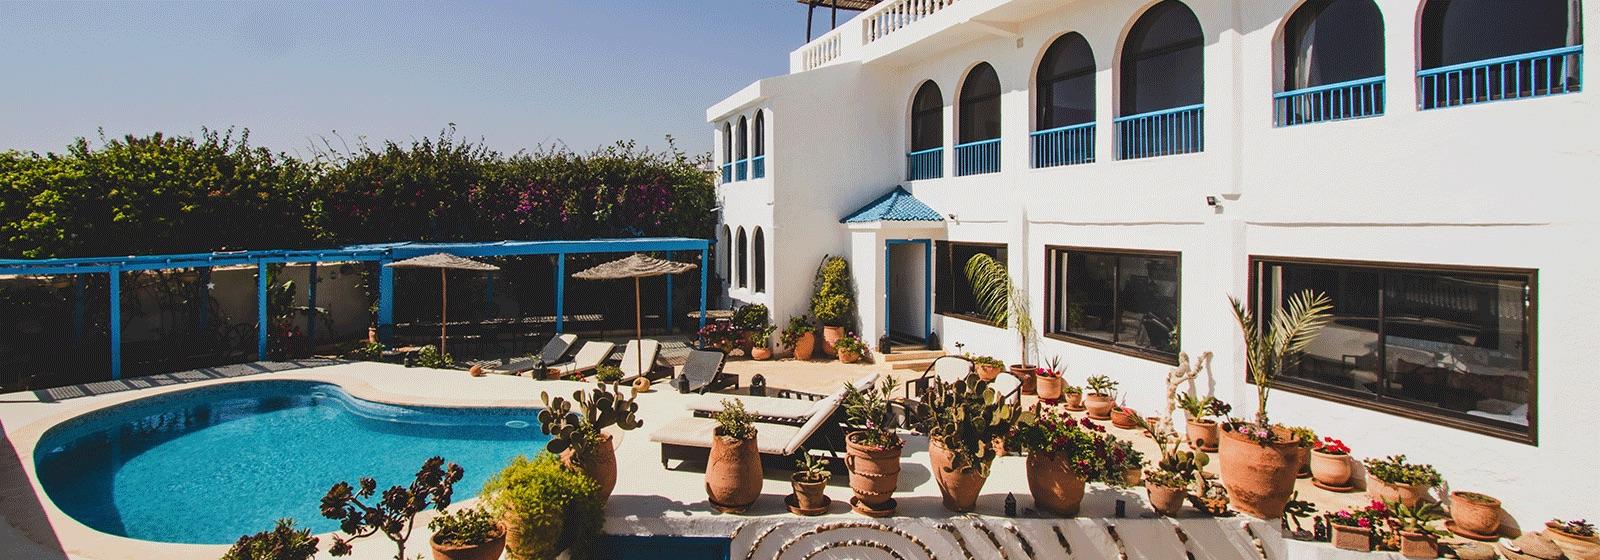 morocco-yoga-retreat-venue.jpg